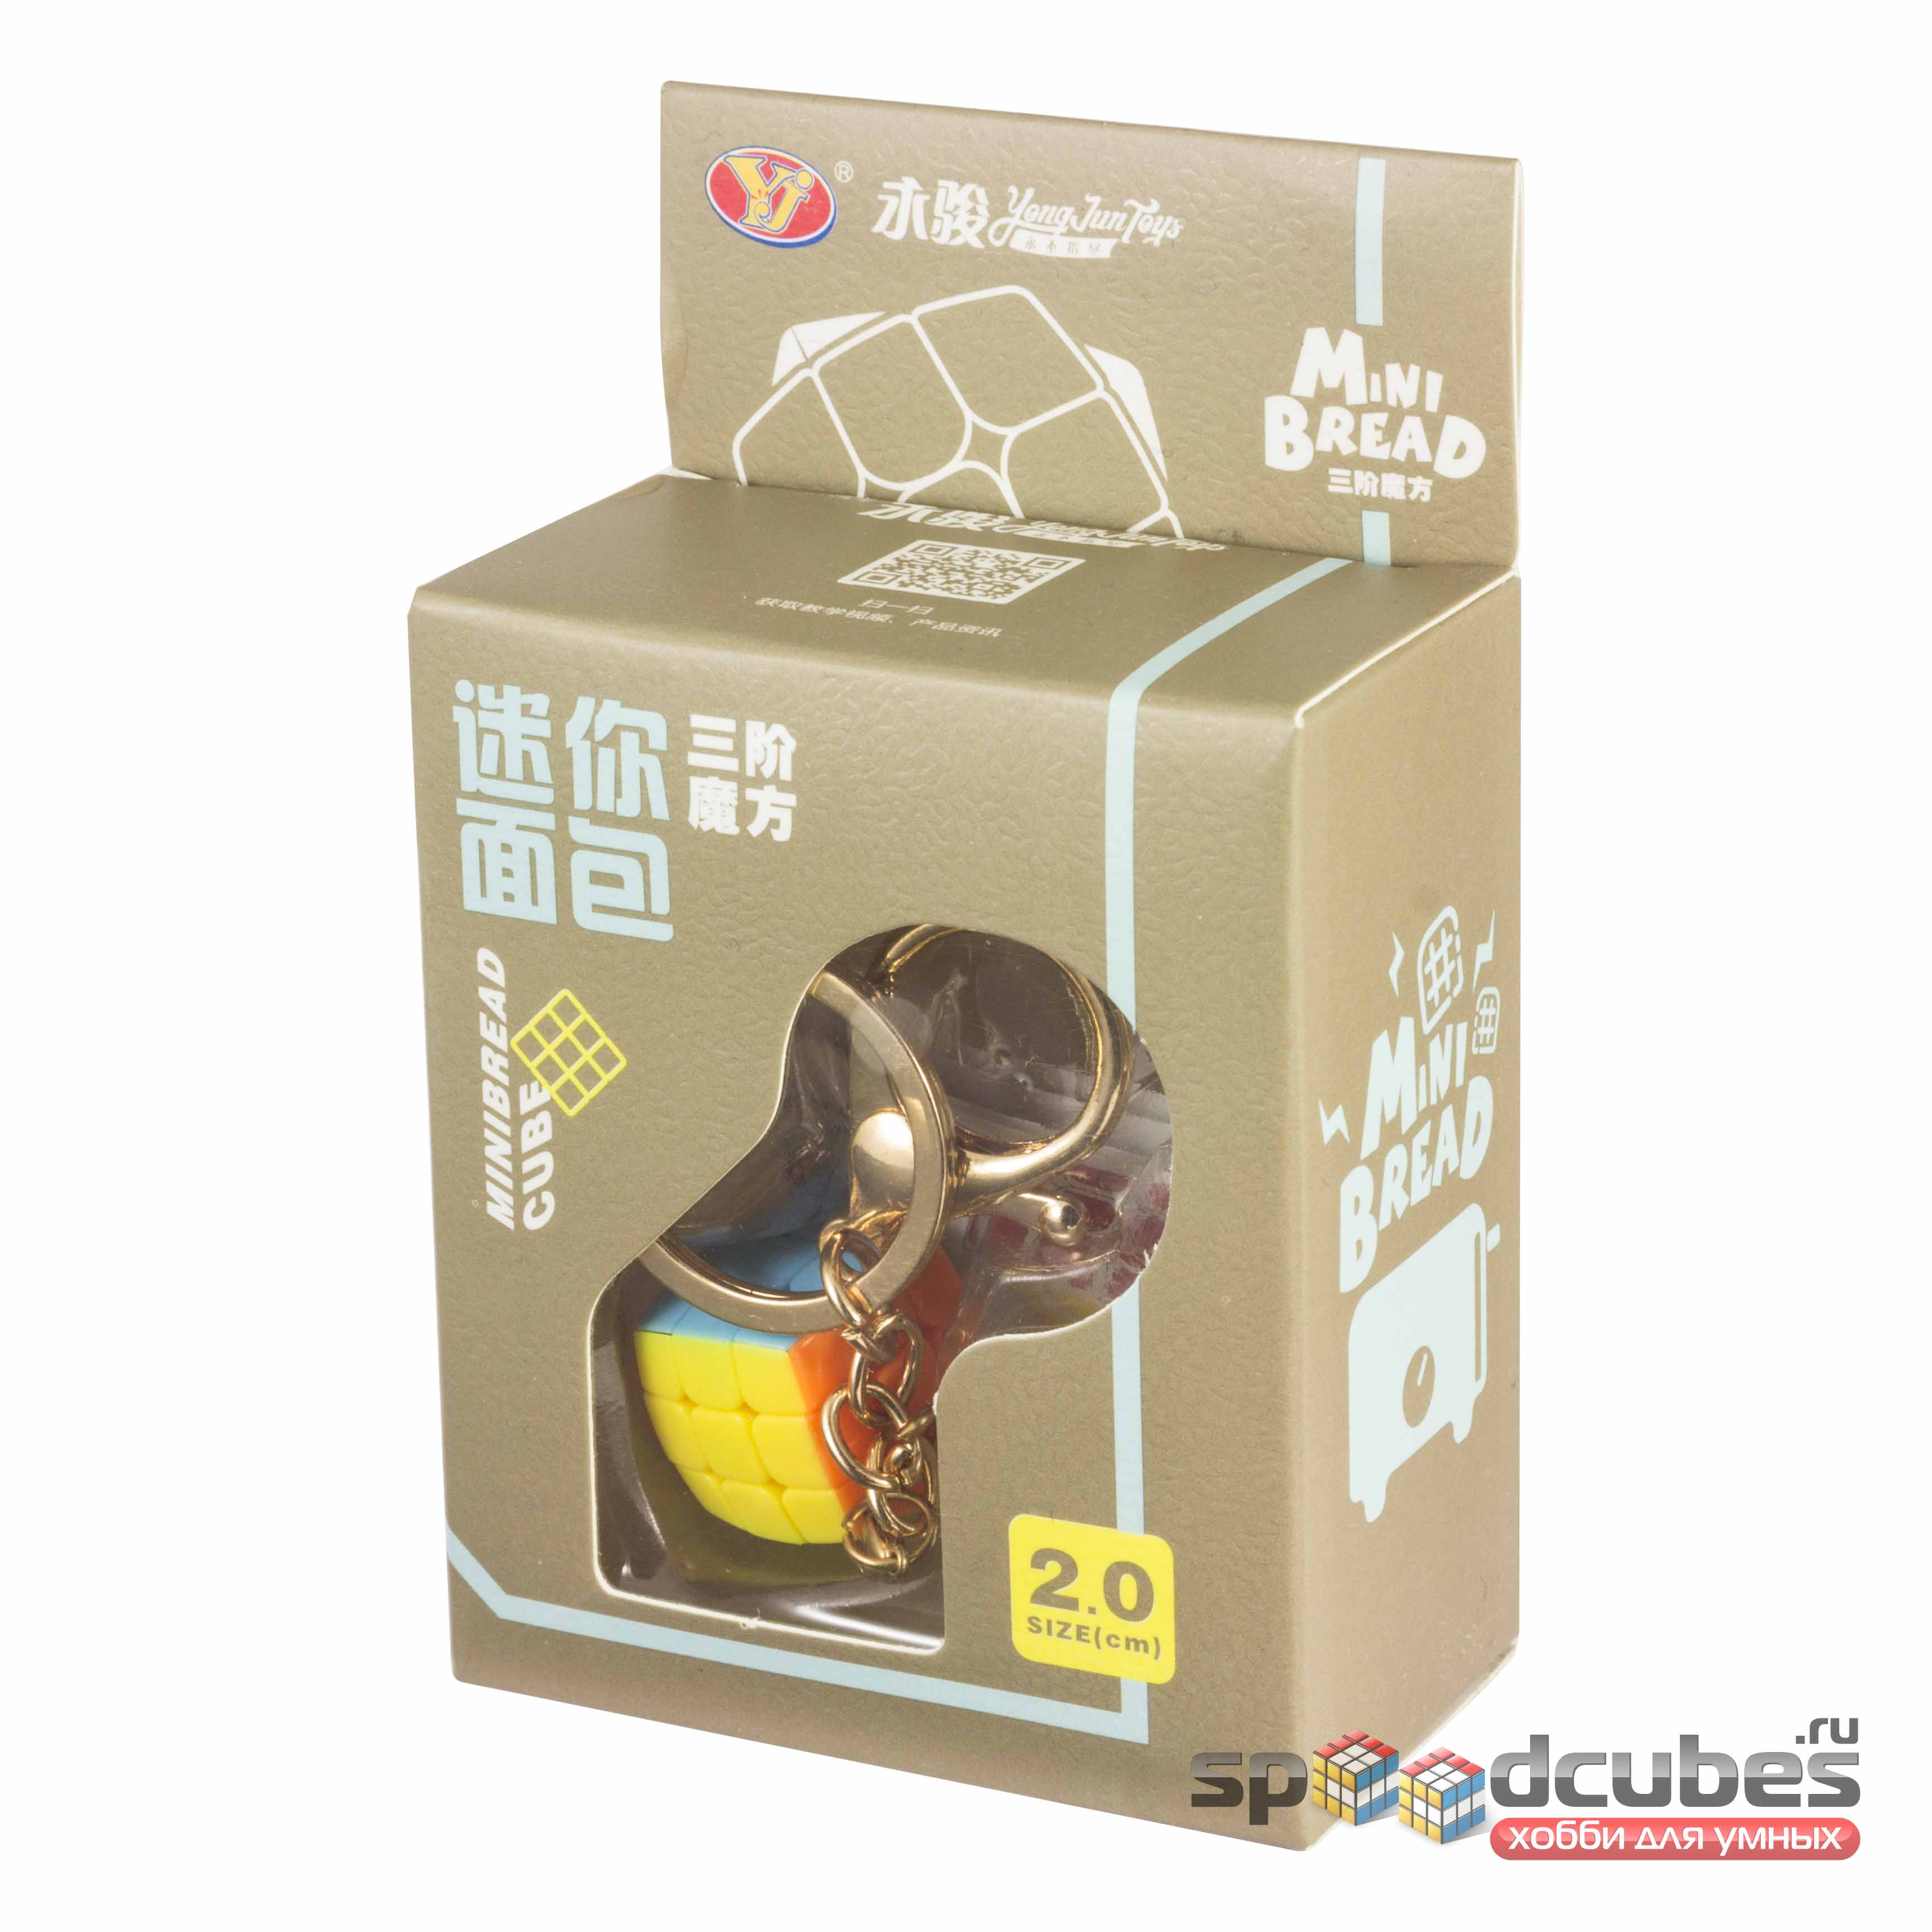 YJ 3x3x3 брелок MiniBread Cube 2.0 см 1